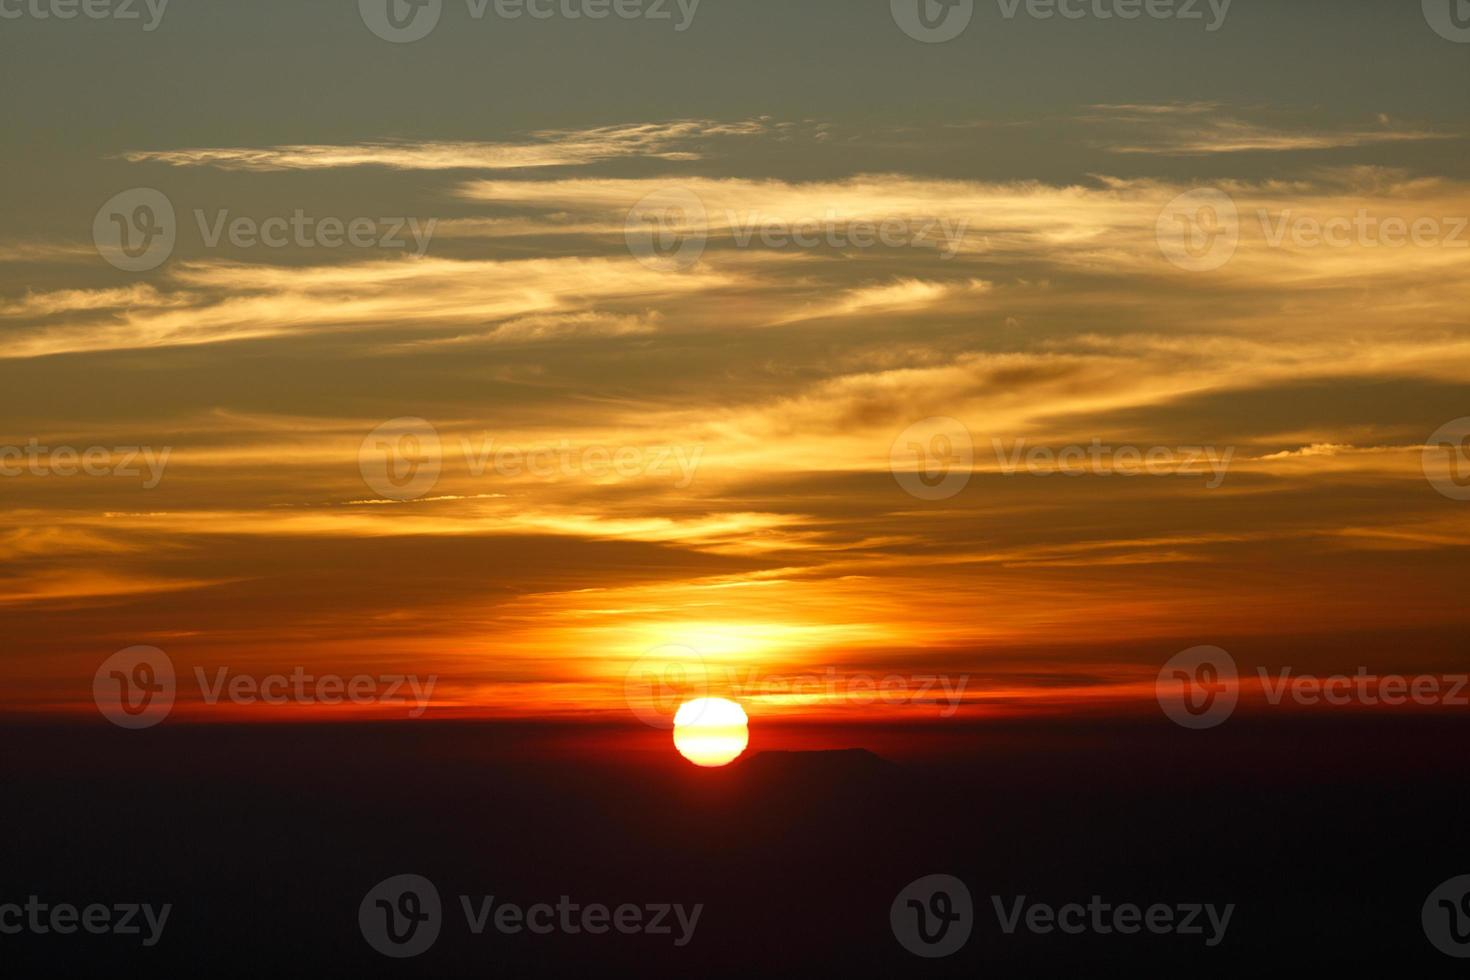 zonsopgang, avondrood achtergrond. foto